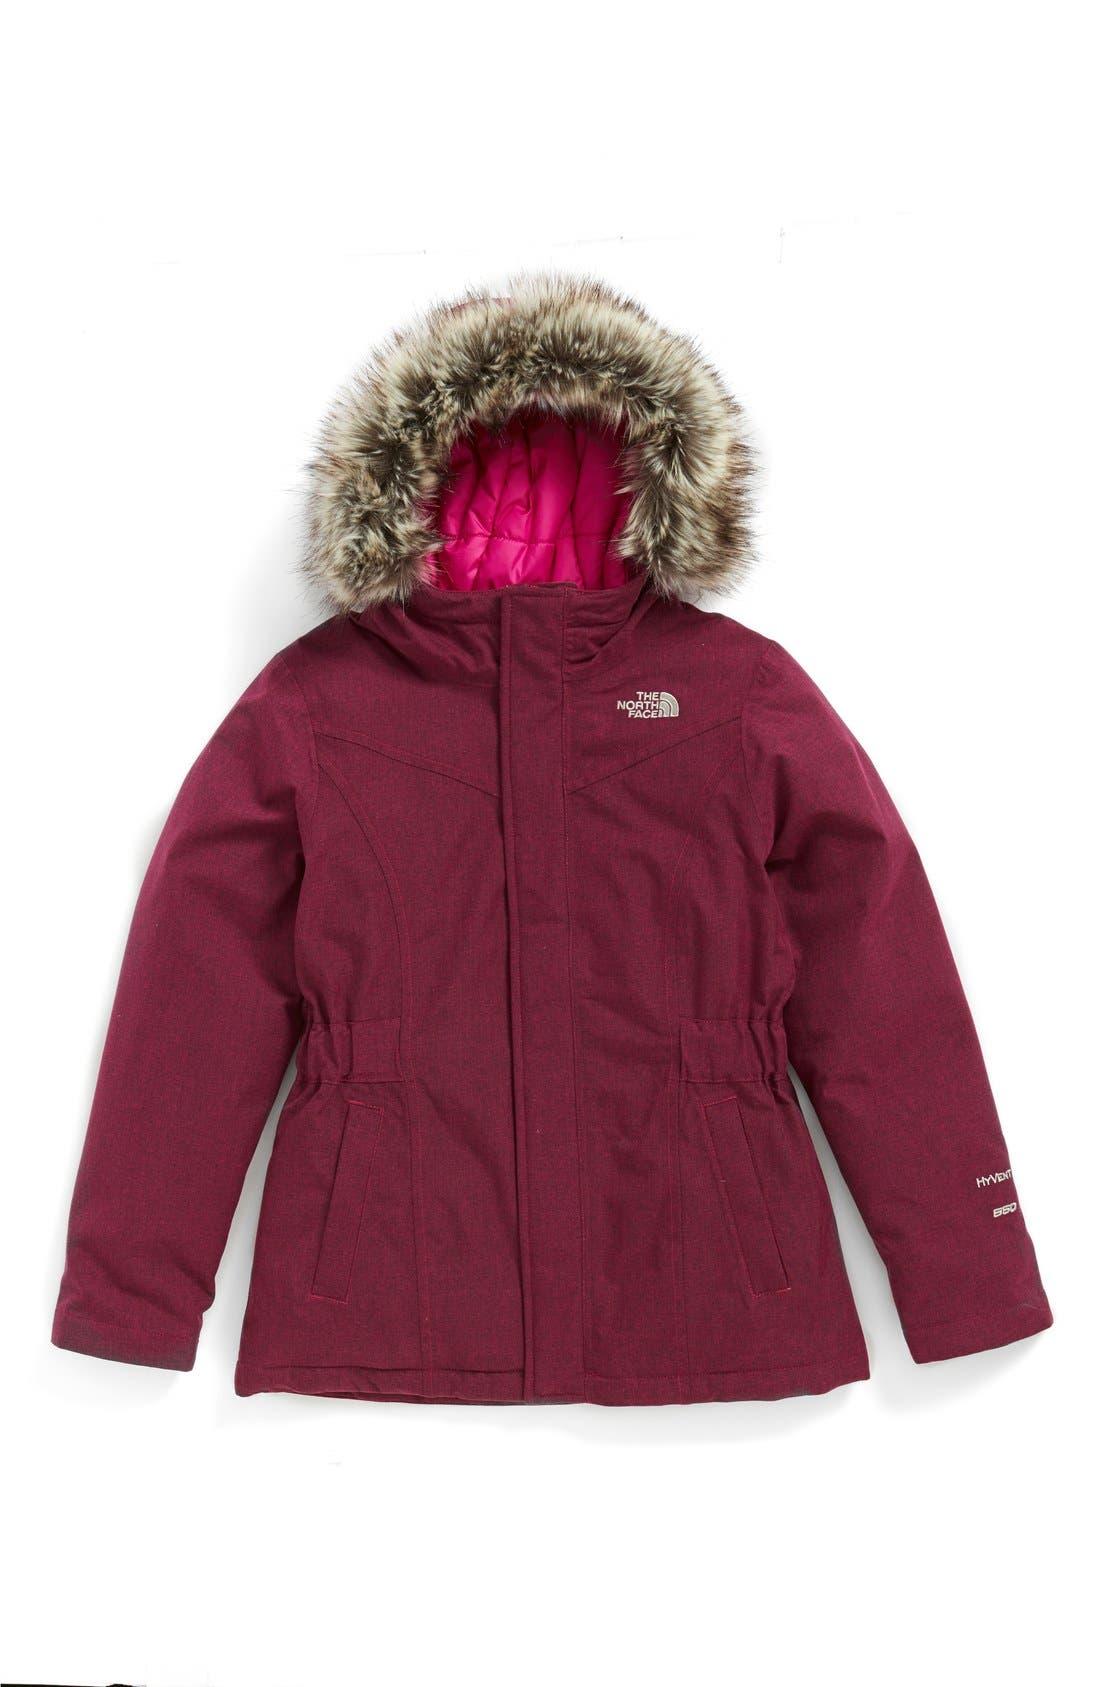 Main Image - The North Face 'Greenland' Waterproof Down Jacket (Big Girls)